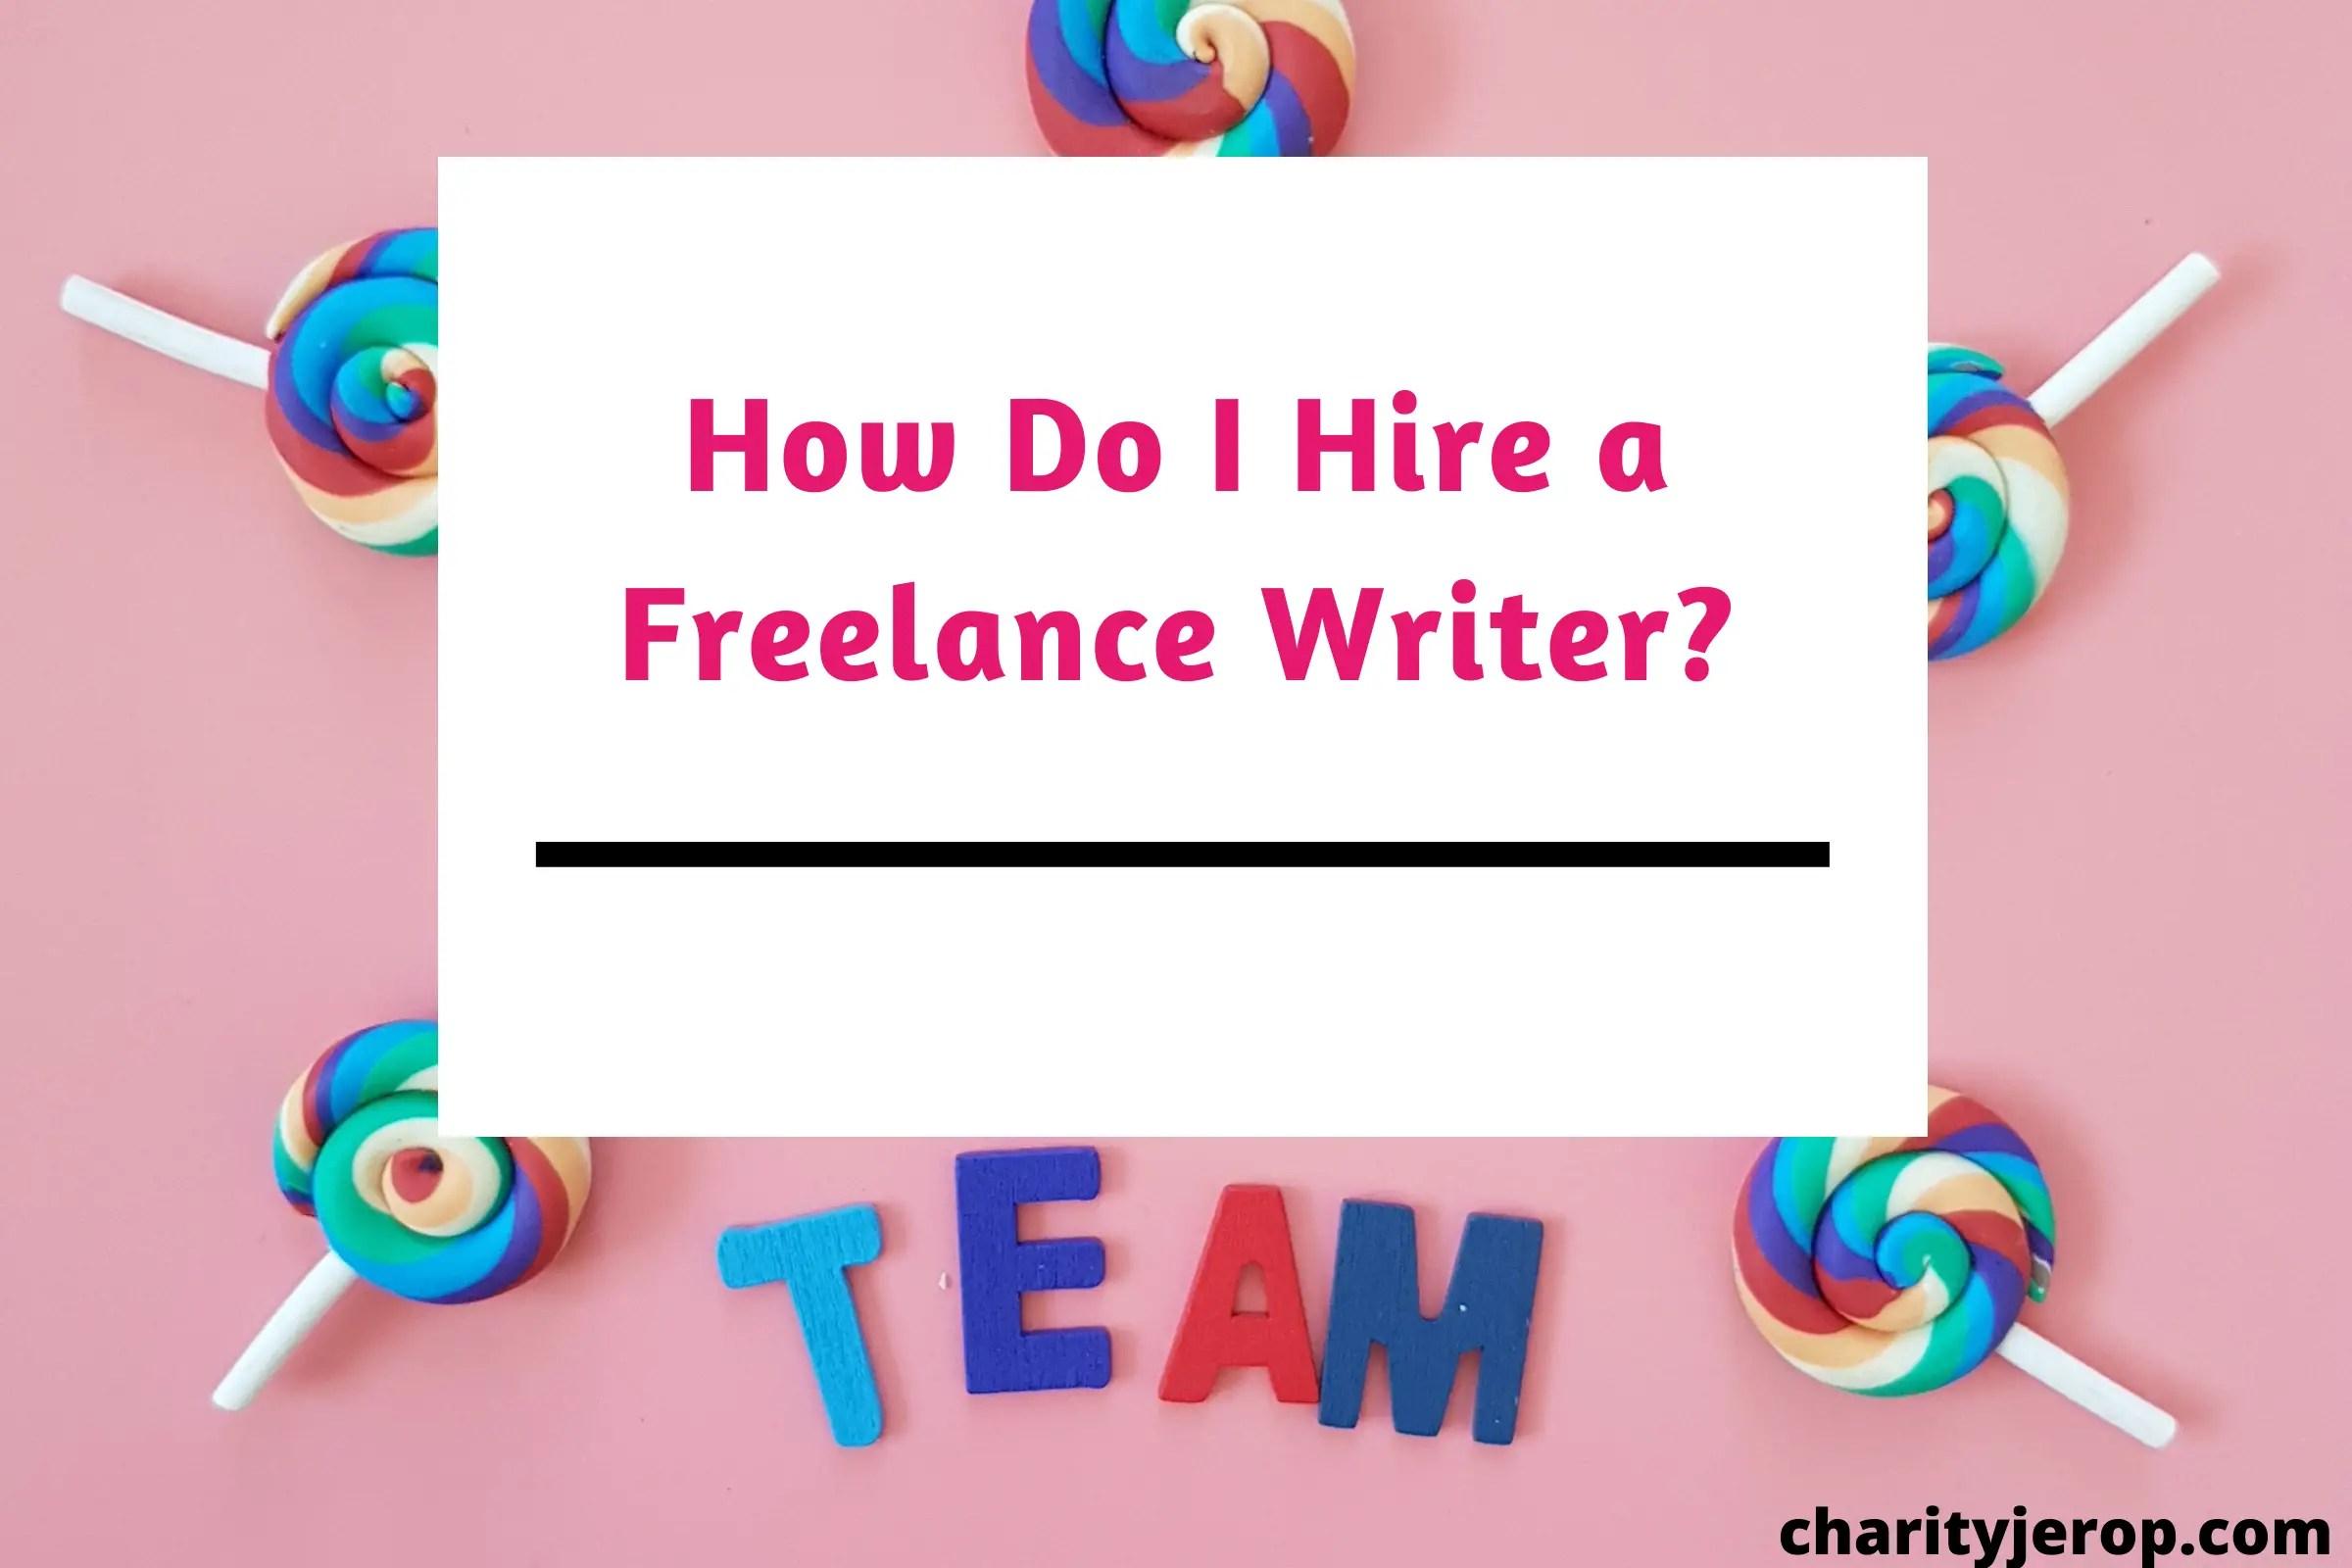 How Do I Hire a Freelance Writer?